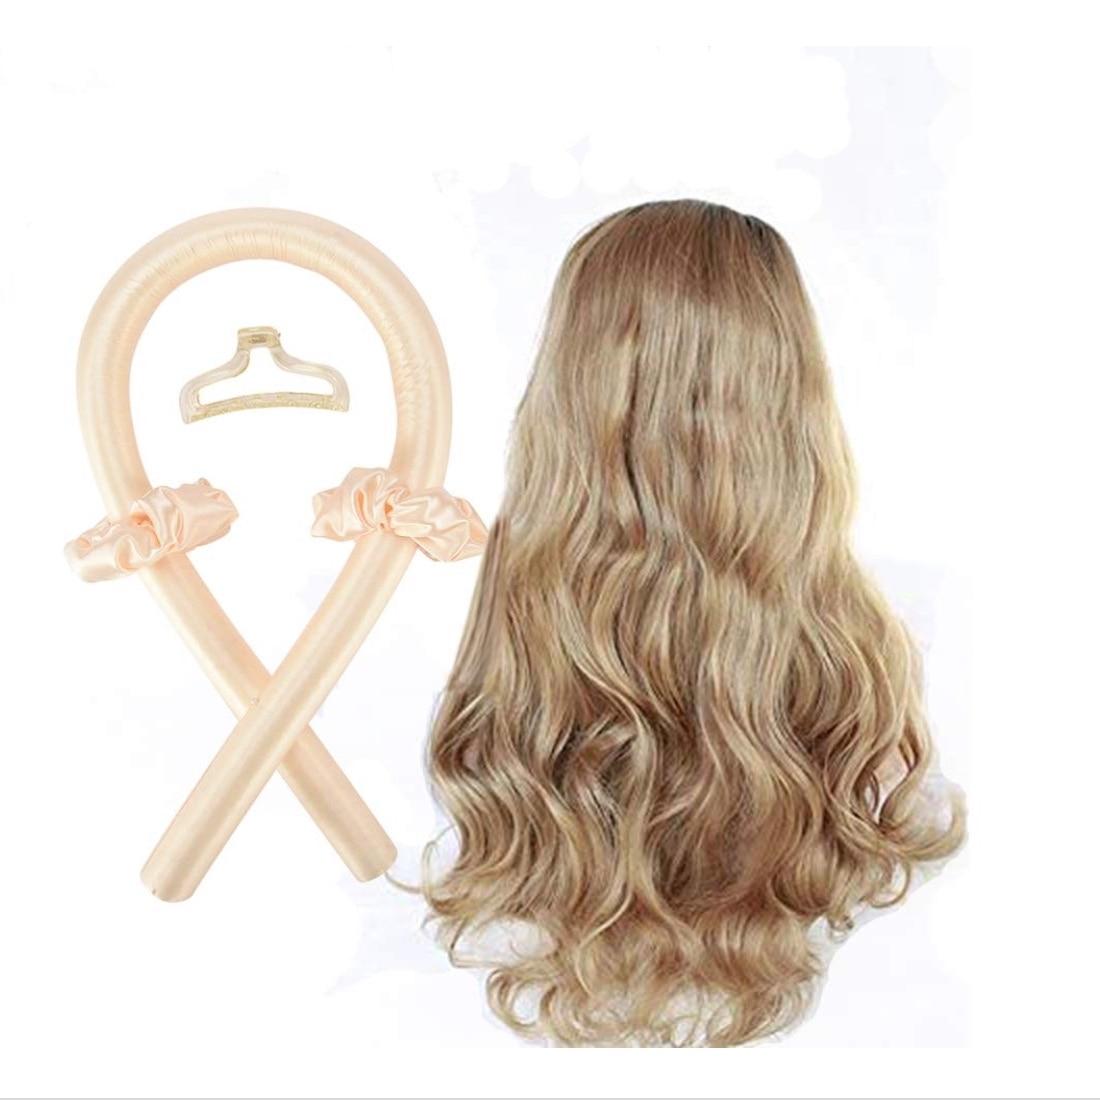 4PCS/Set Heatless Hair Curlers For Long Hair To Sleep In Overnight and No Heat Silk Curls Headband w